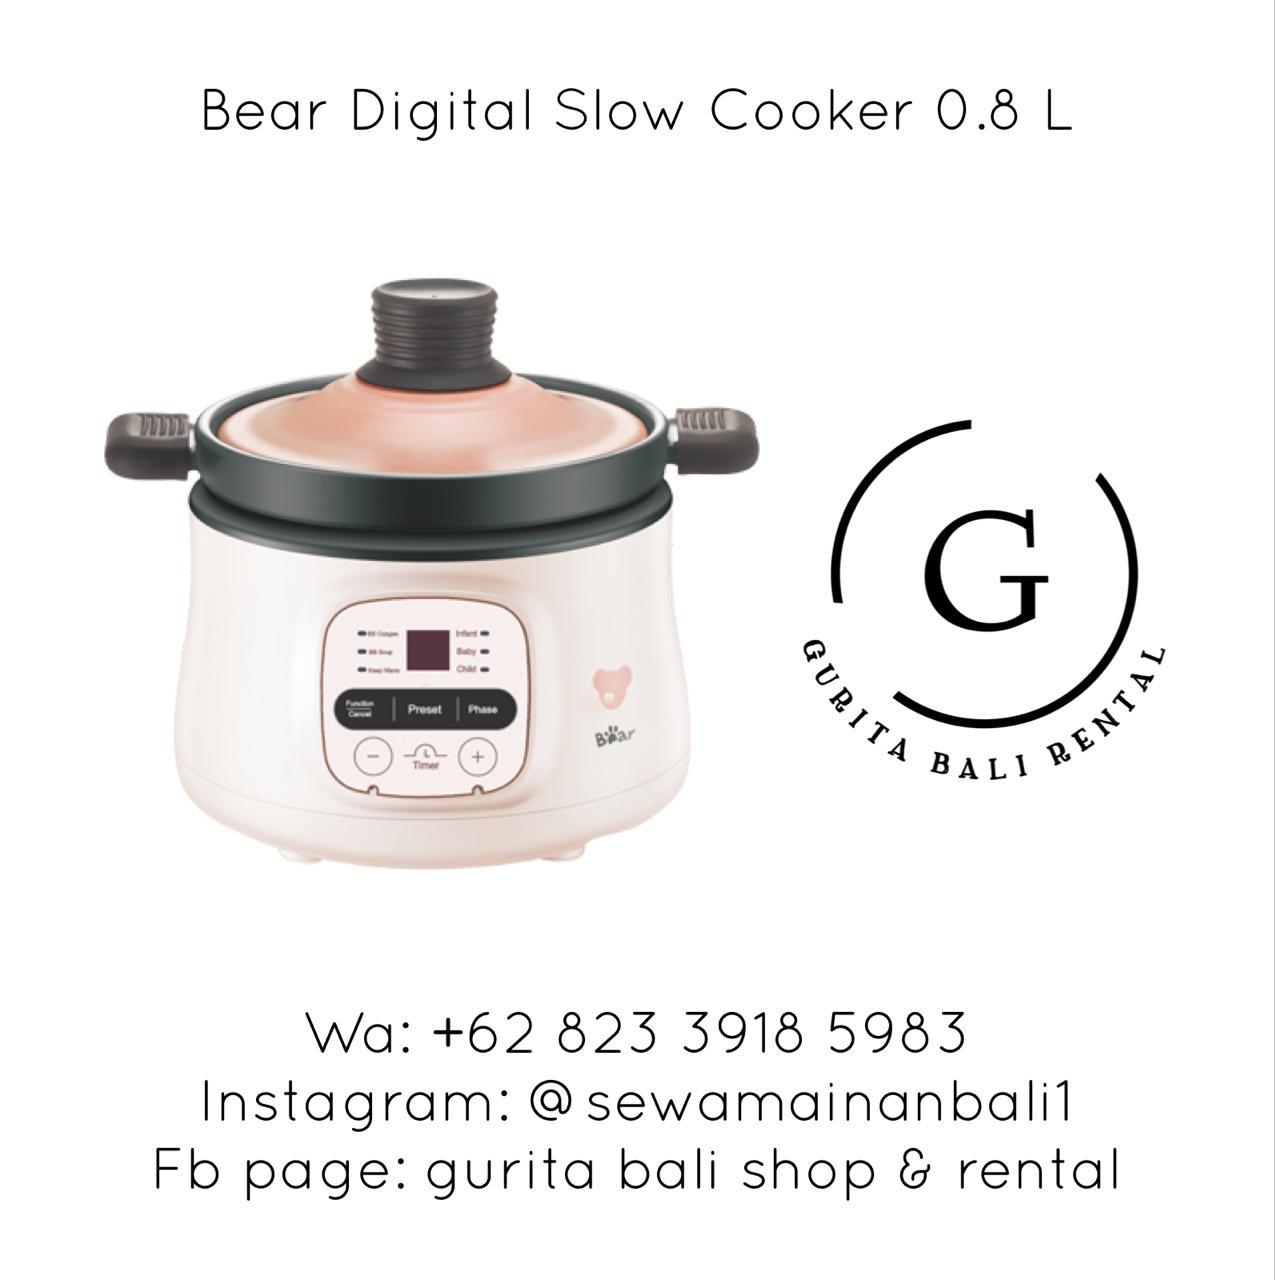 BEAR DIGITAL SLOW COOKER 0.8 L (1)